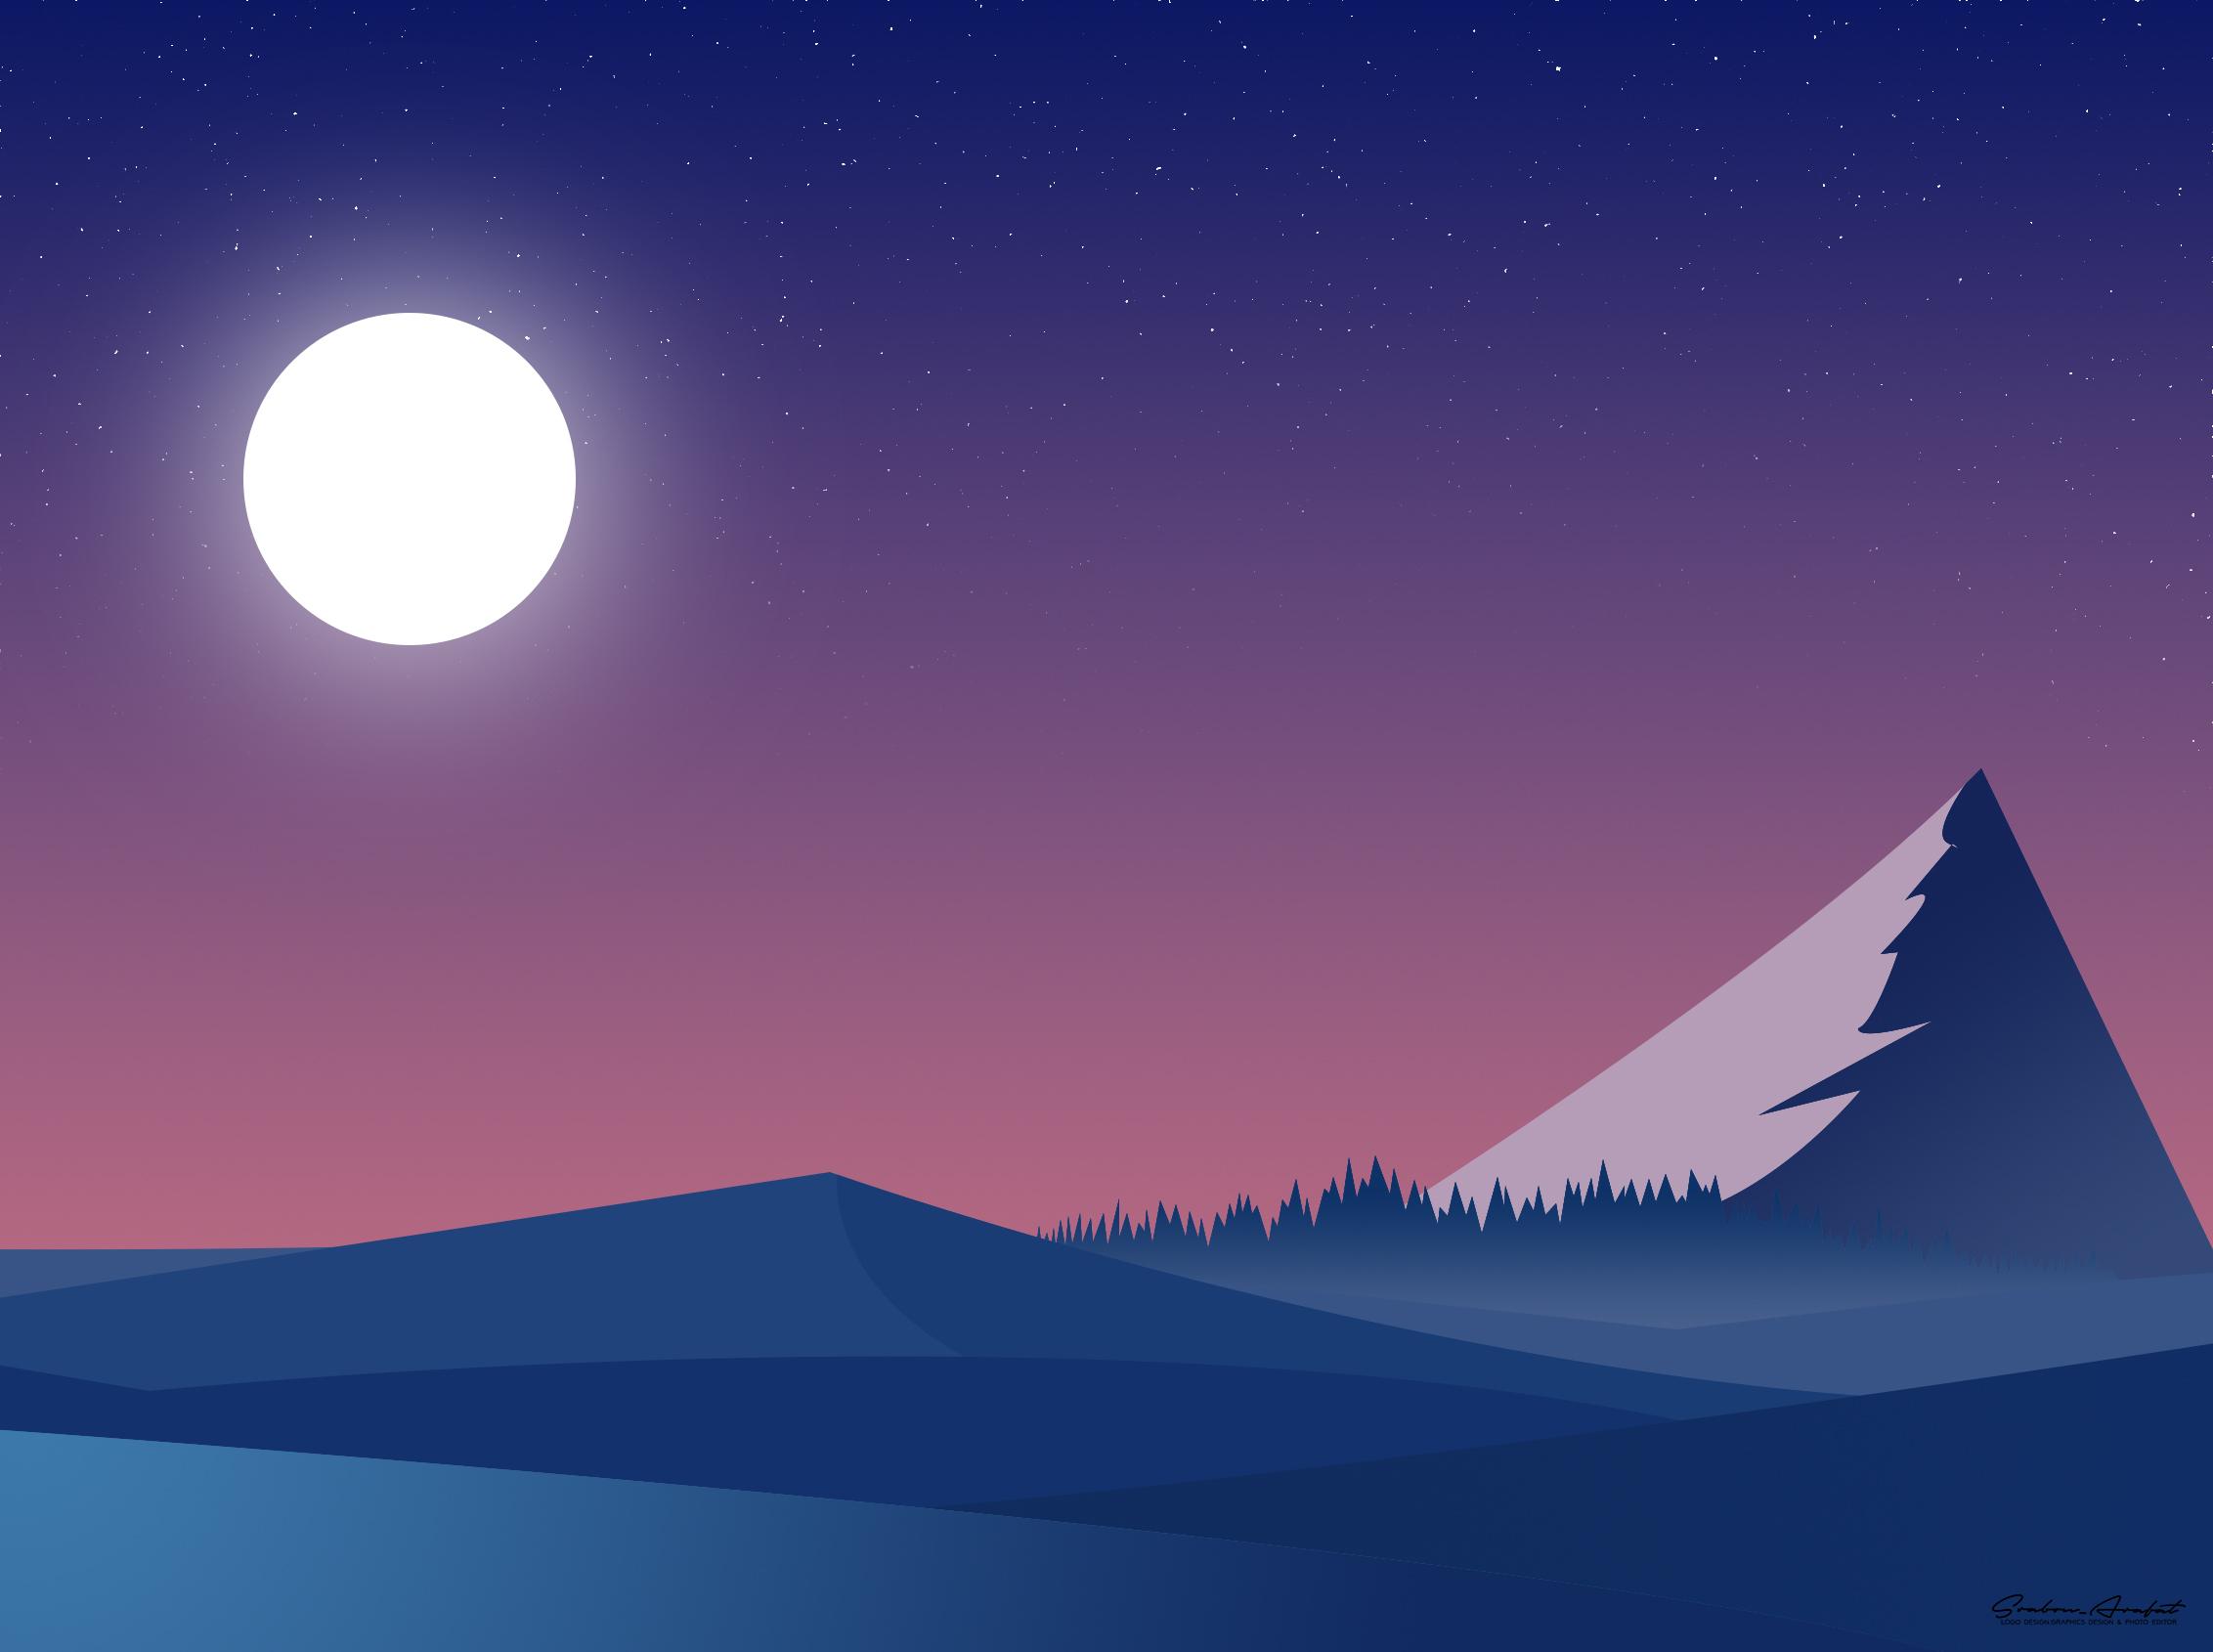 Landscape Mountains Minimalist, HD Artist, 4k Wallpapers ...